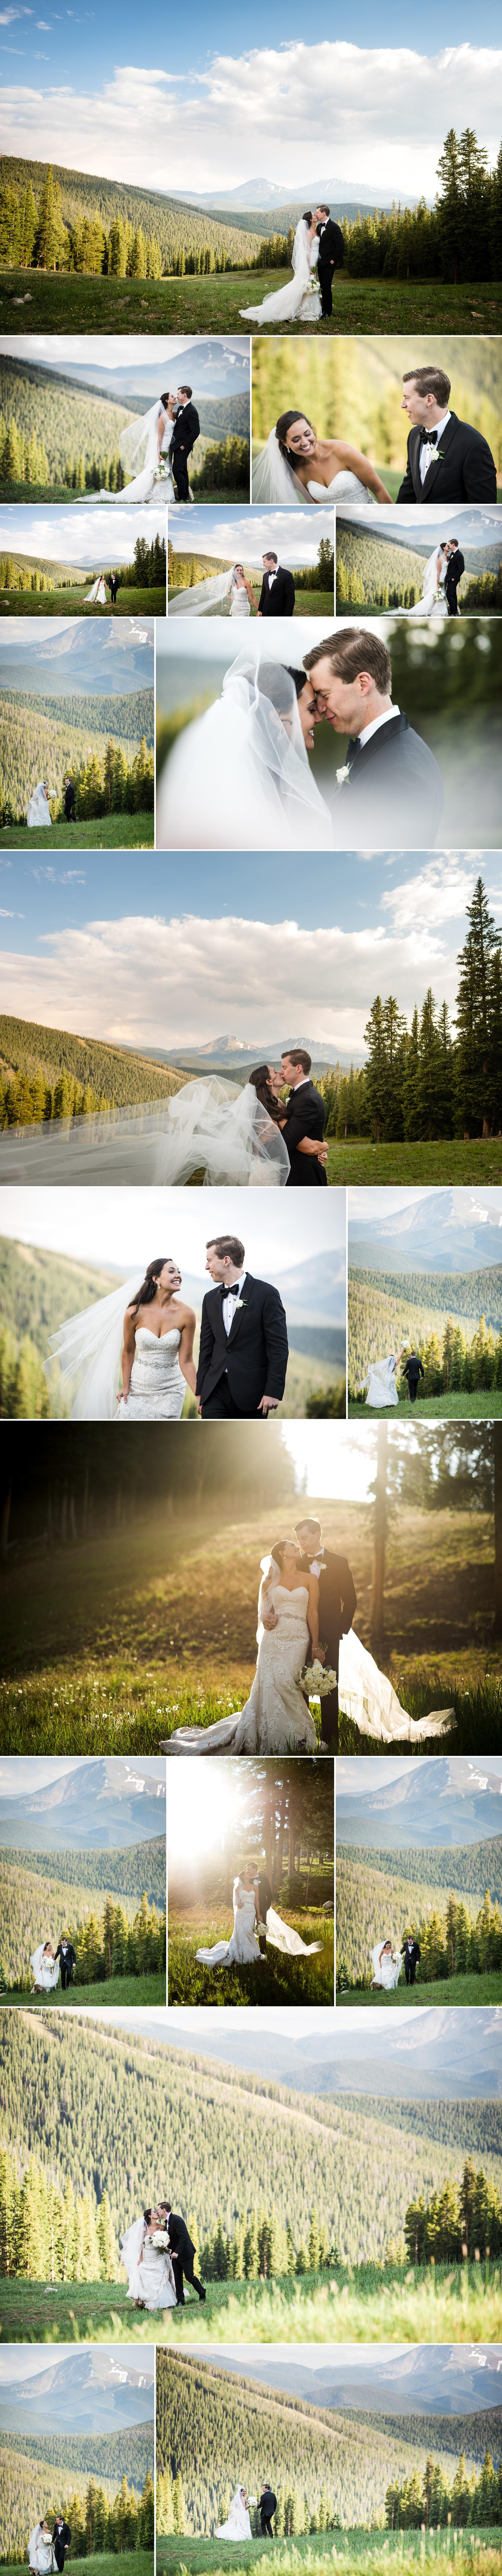 Alli and Mike's Timber Ridge Lodge Wedding Photos